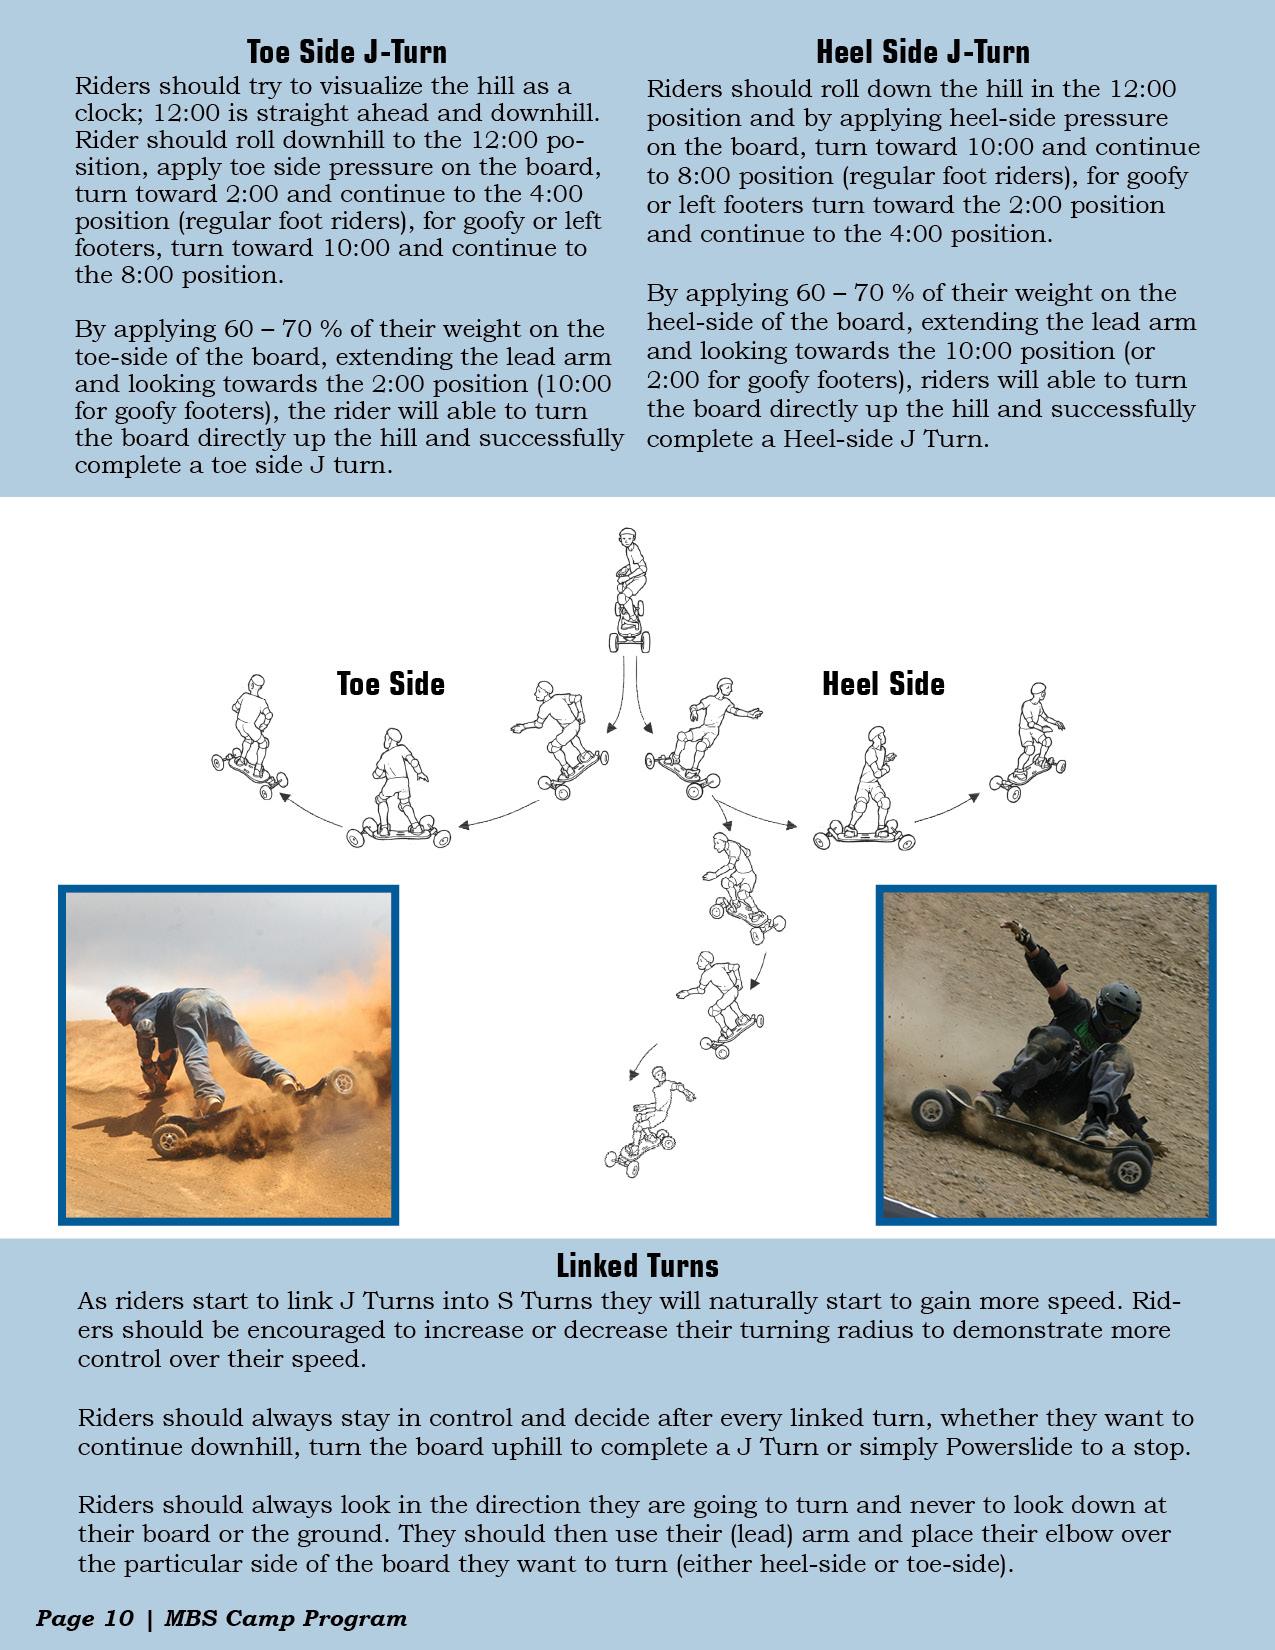 MBS Camp Program - Manual - Final Draft10.jpg